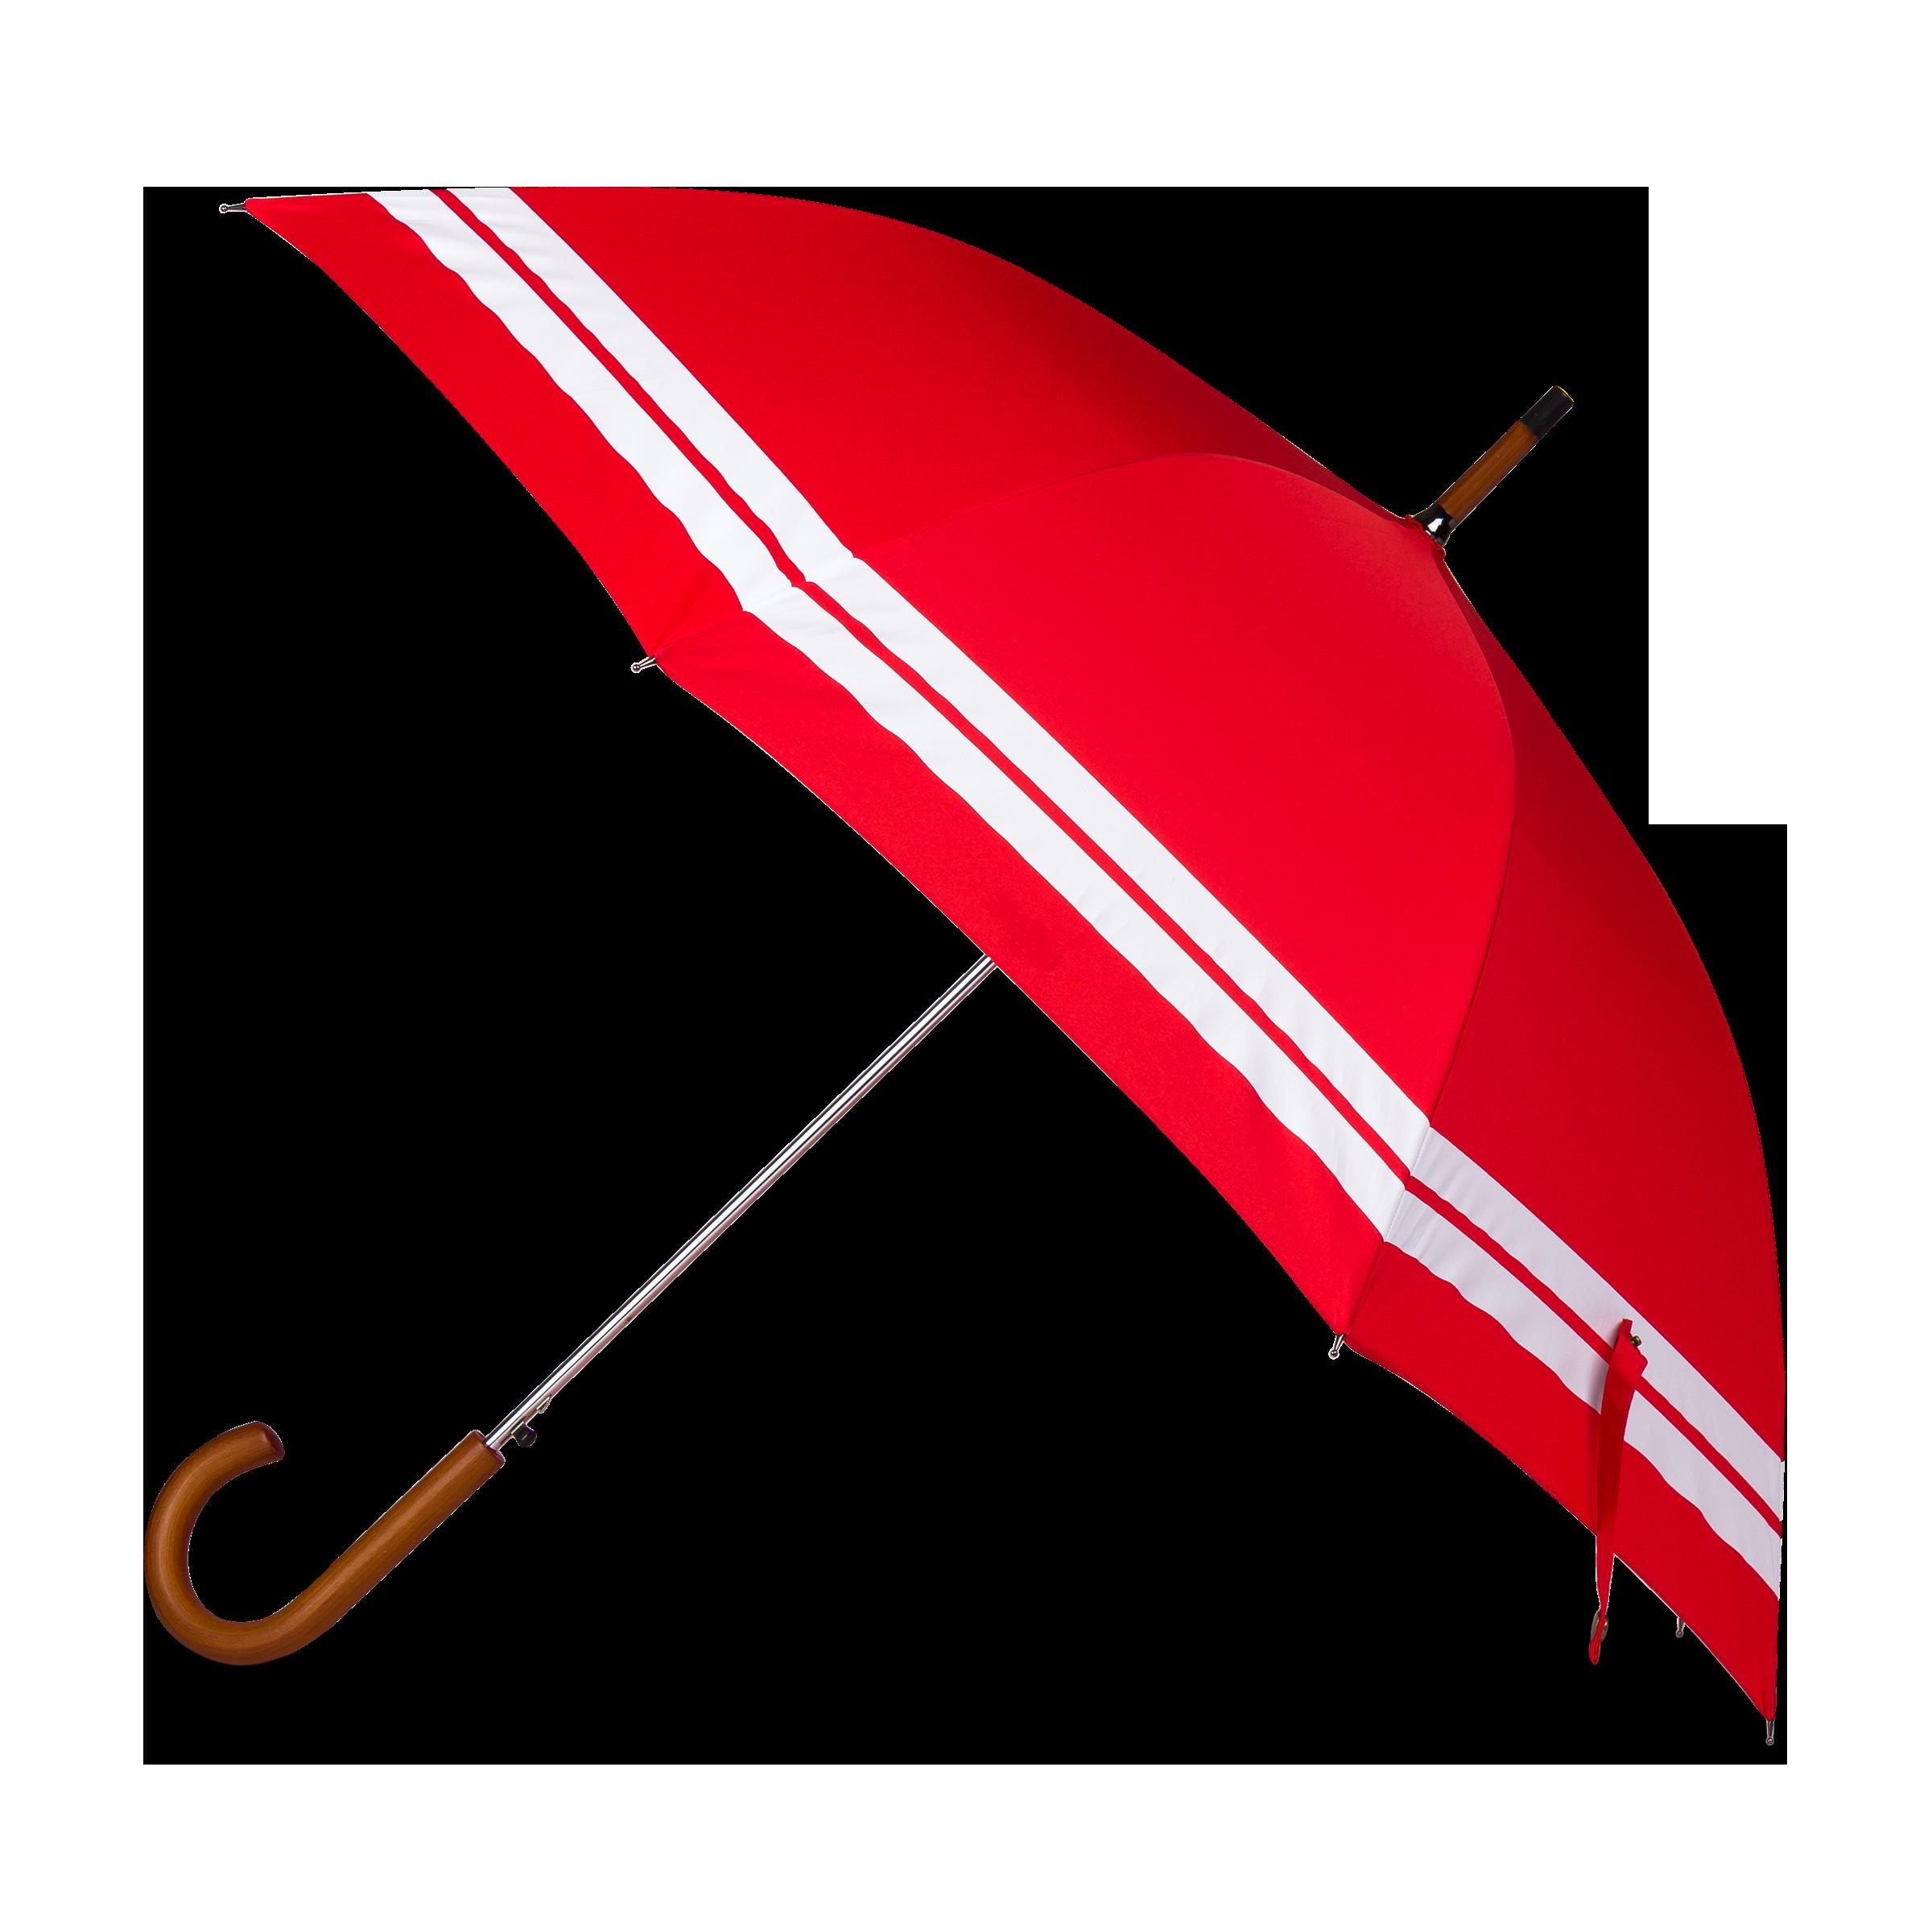 Red umbrella product photo